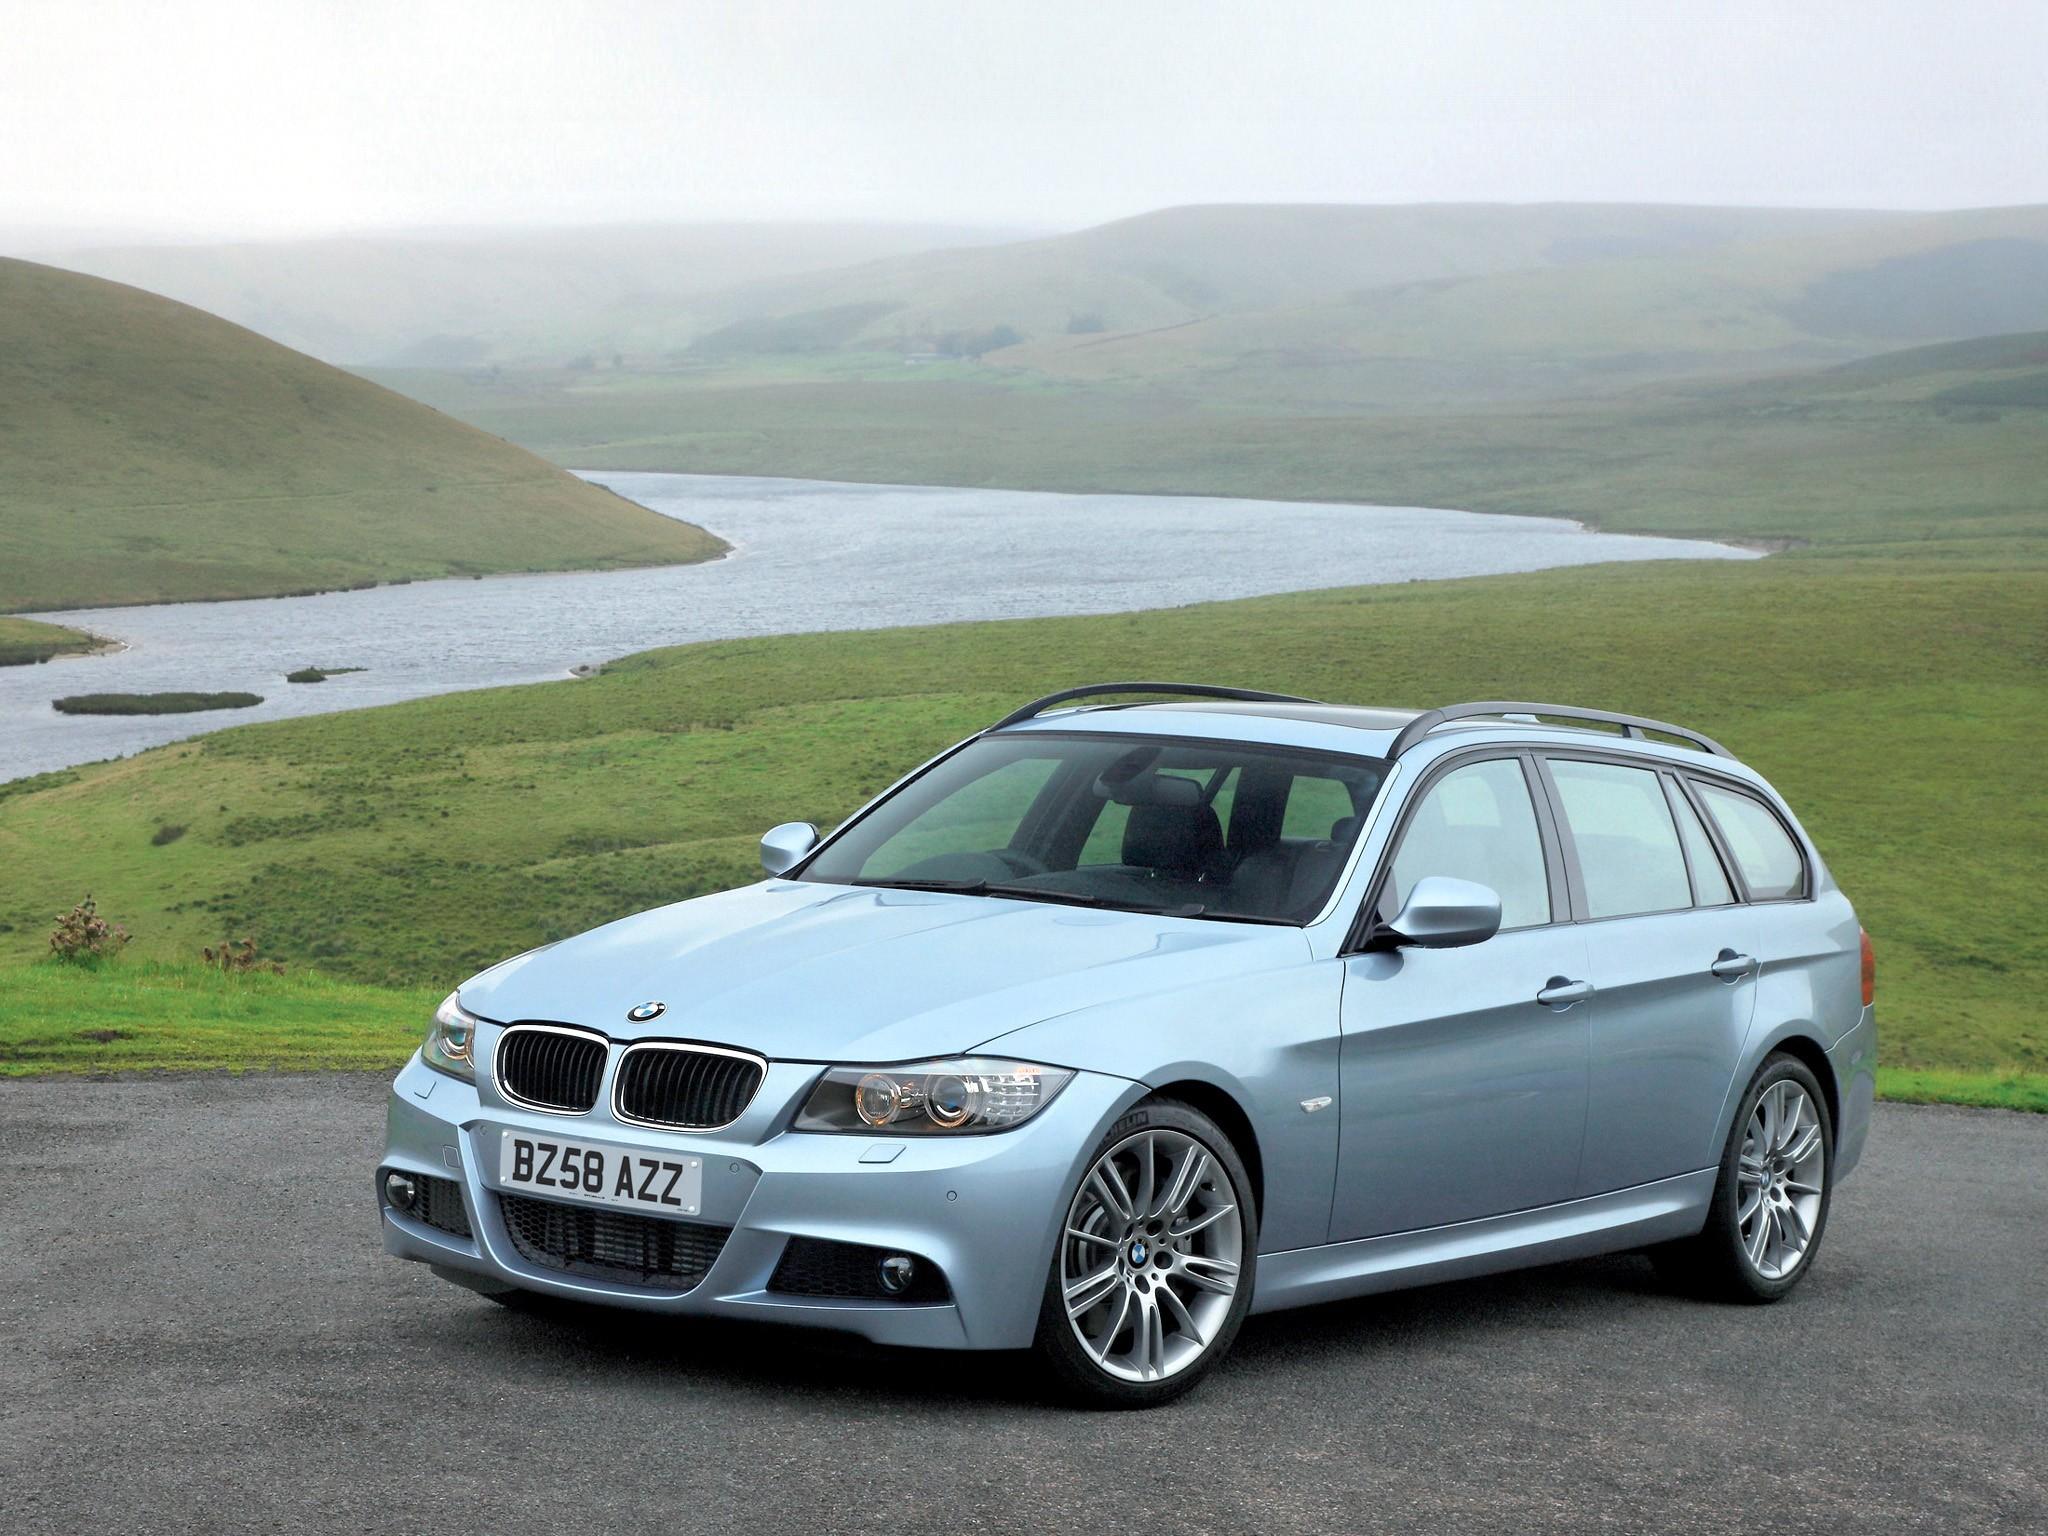 Bmw 320i Xdrive >> BMW 3 Series Touring (E91) - 2008, 2009, 2010, 2011, 2012 - autoevolution